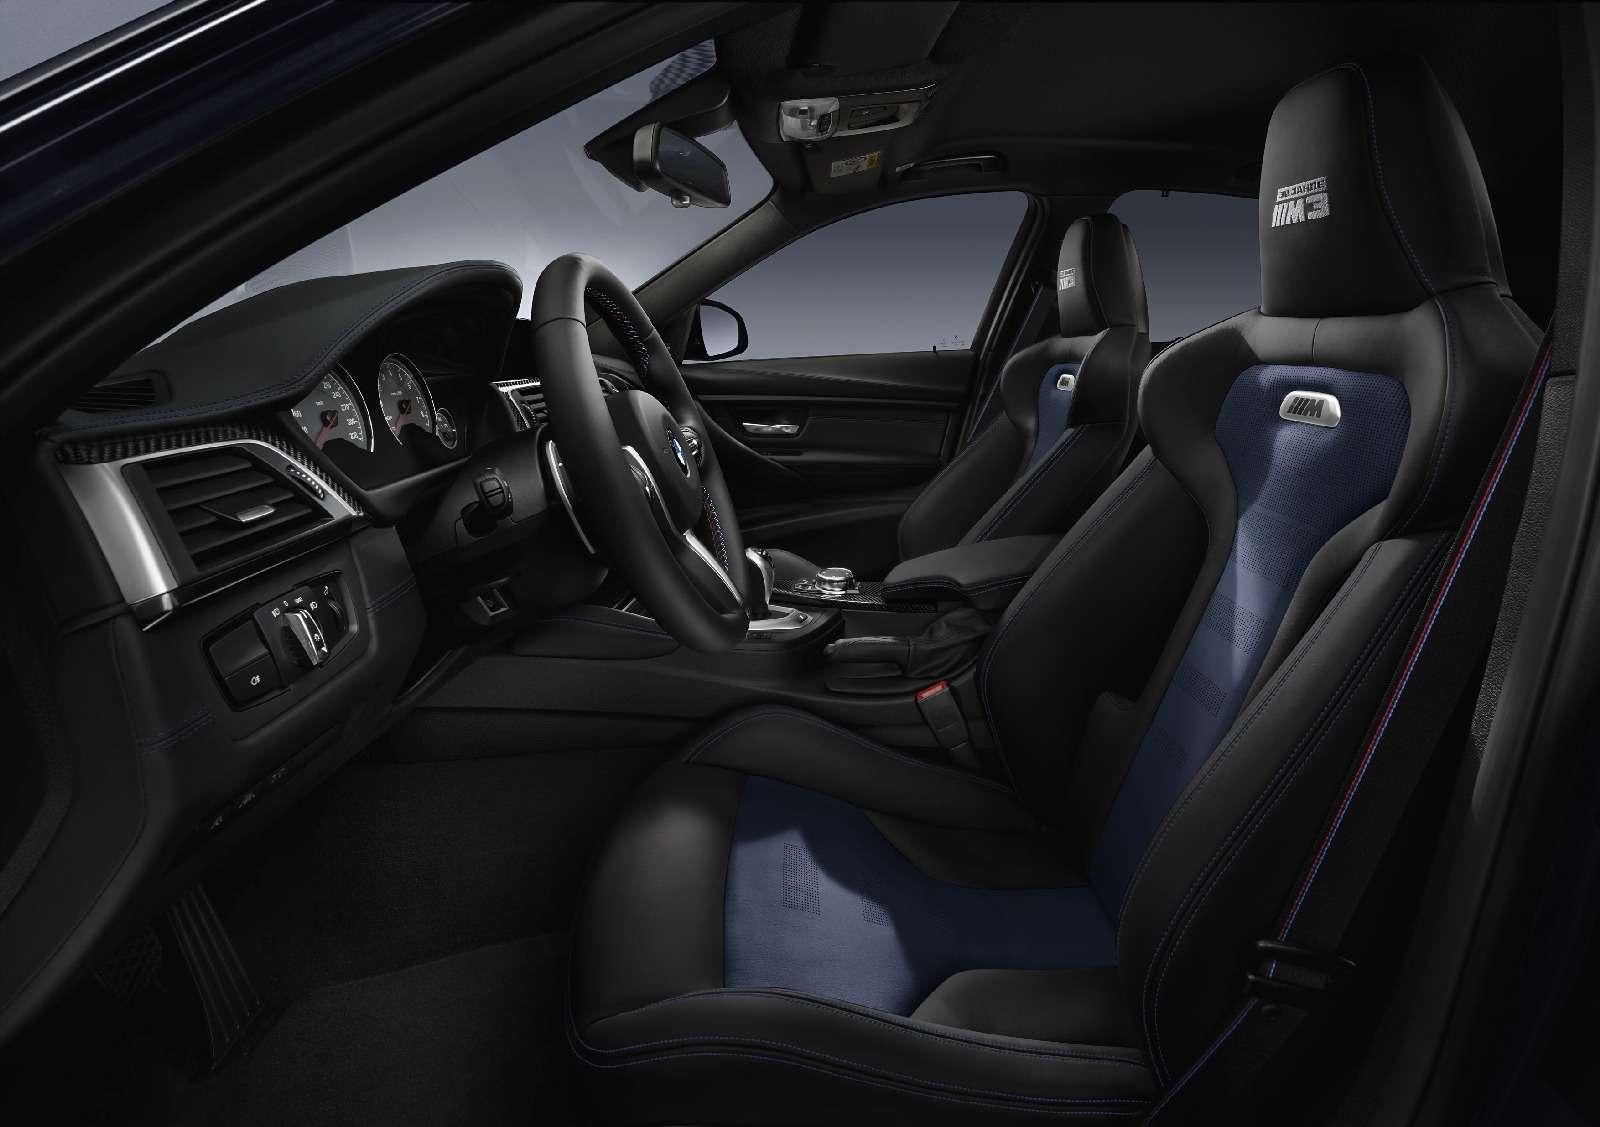 BMWM3отпразднует 30-летний юбилей с«лишними» дверьми— фото 593119